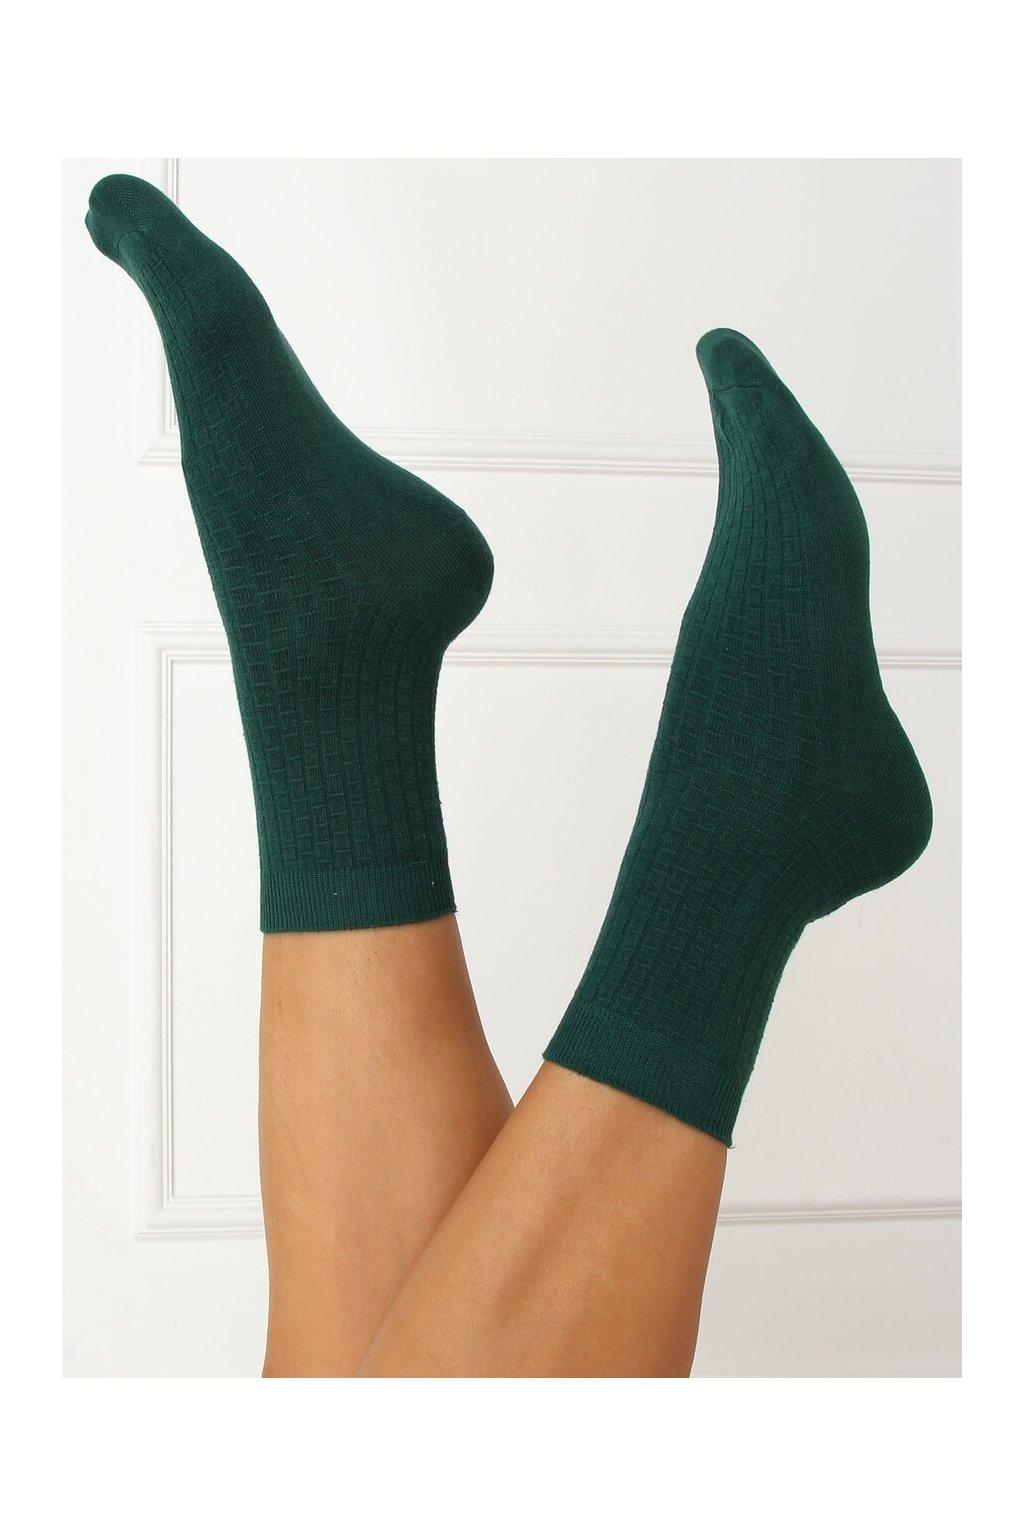 Damske ponožky zelené SK-N8808